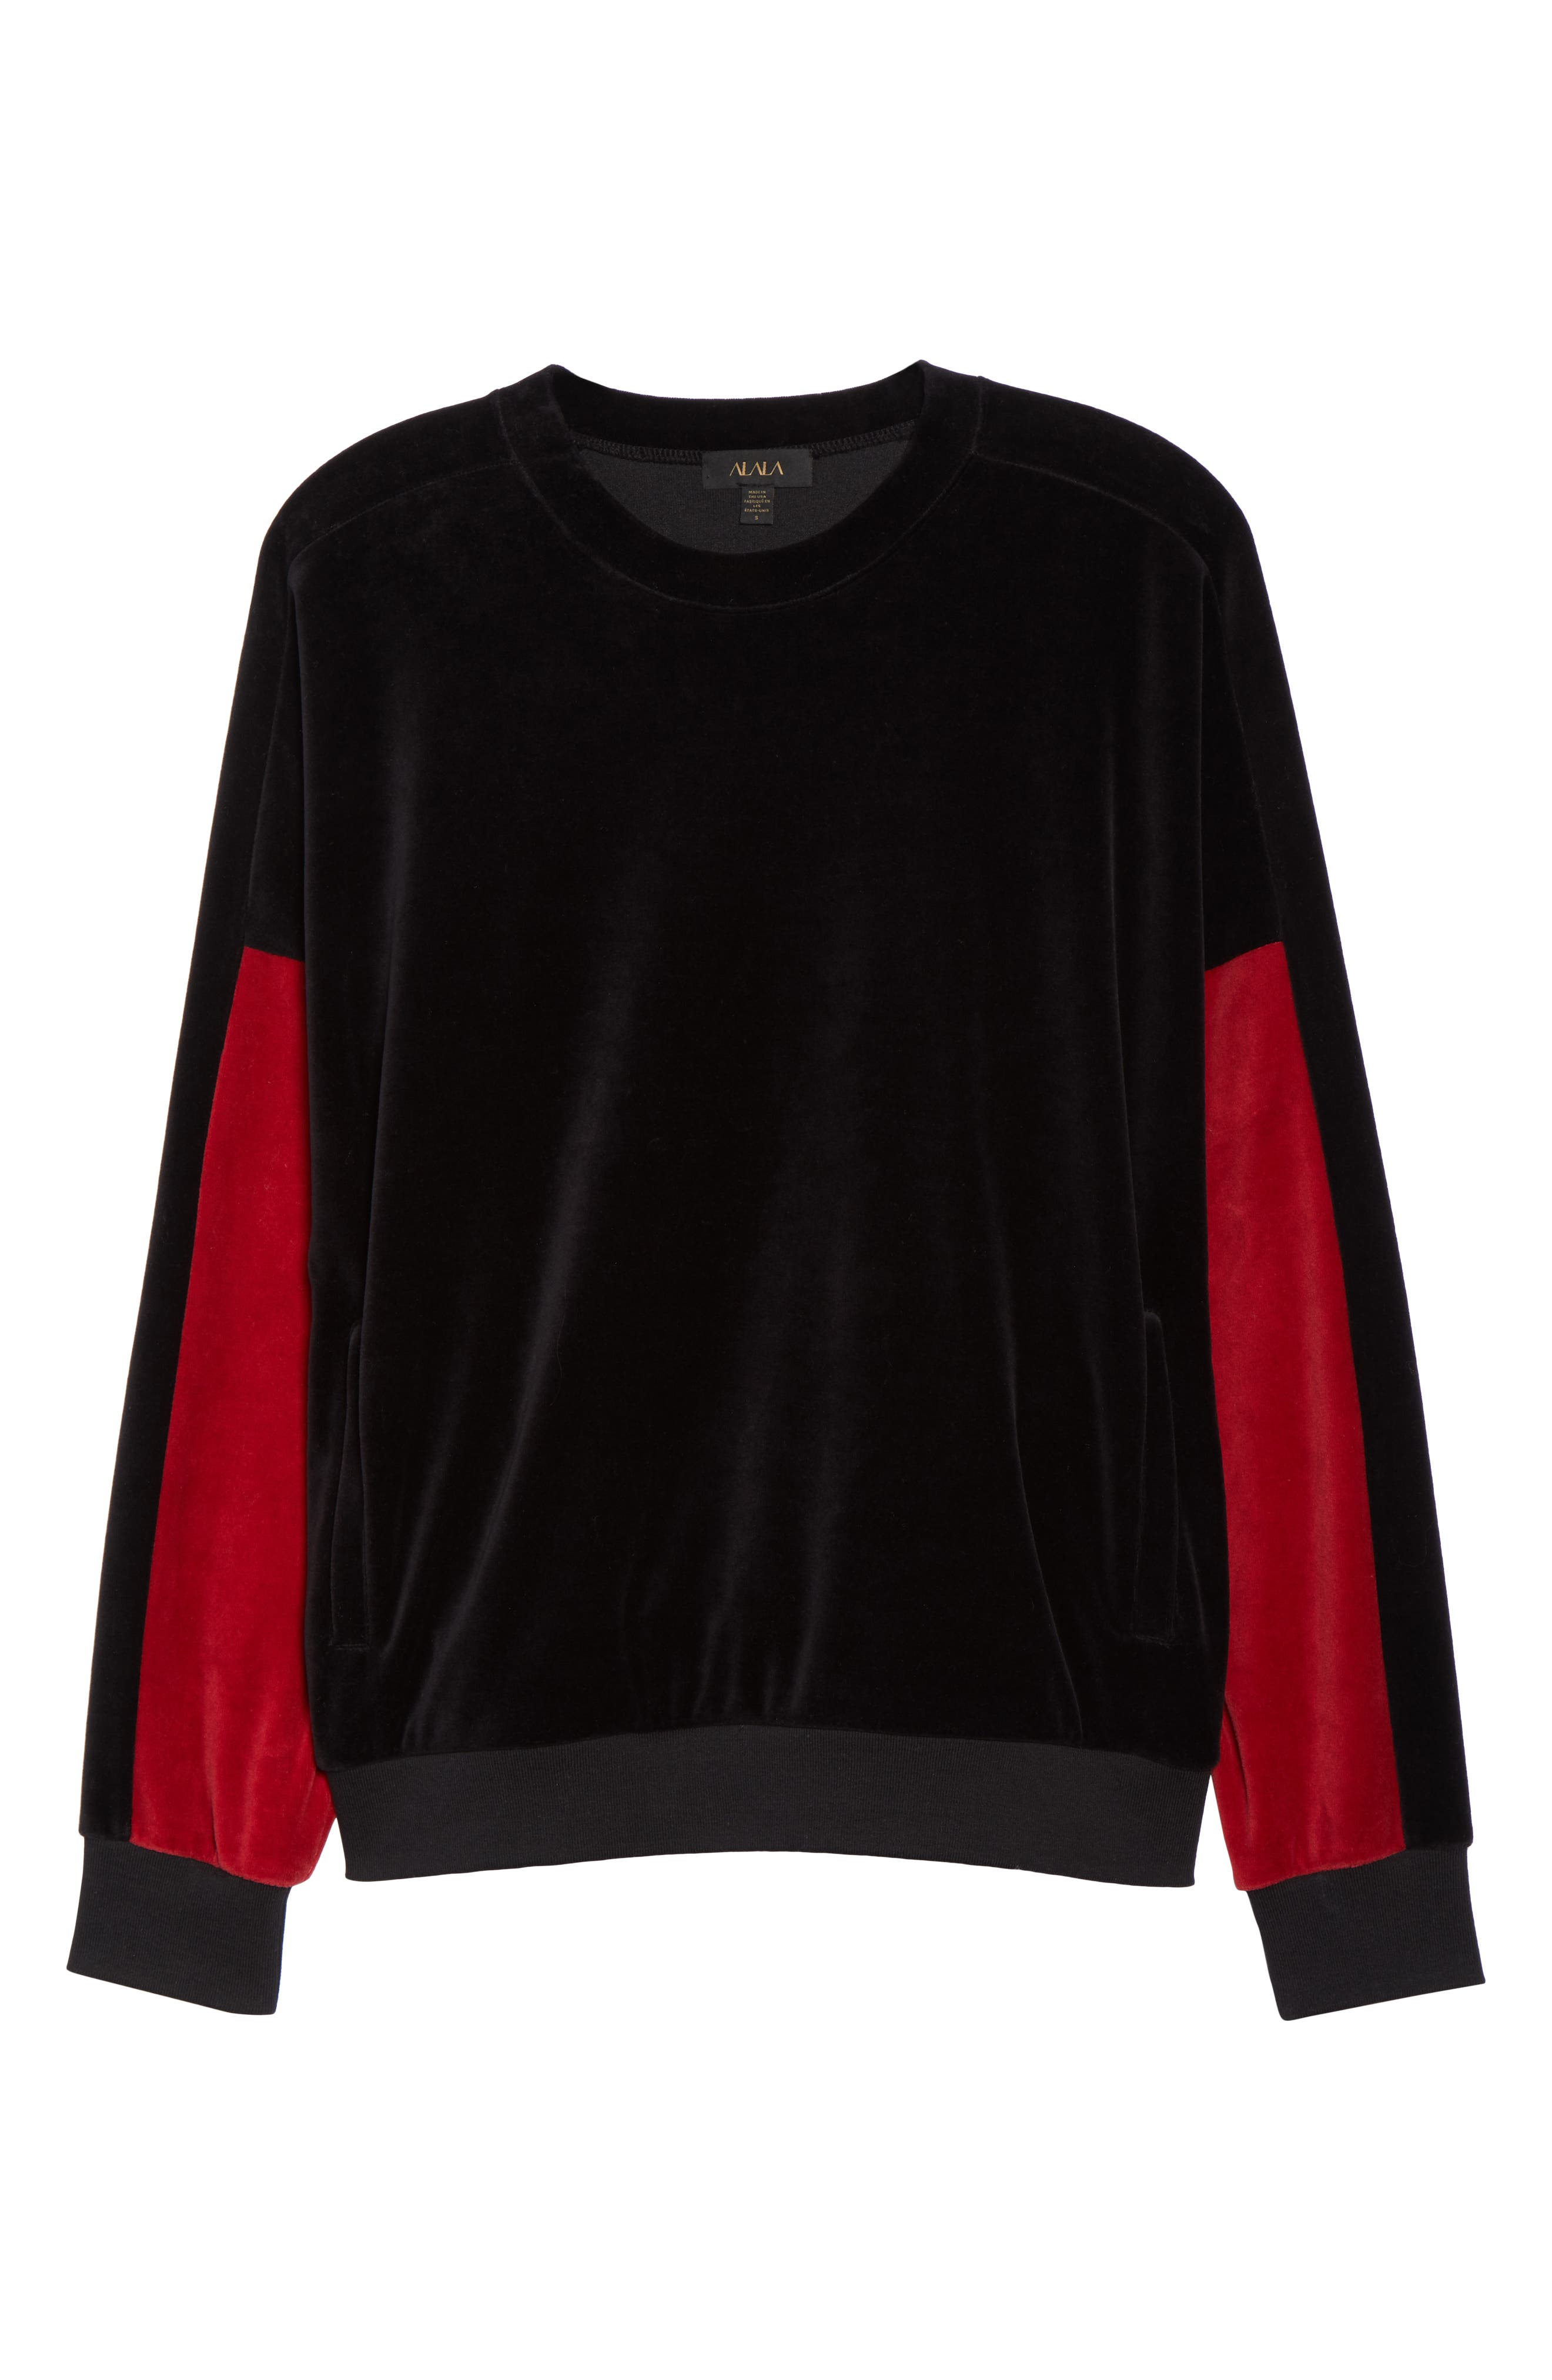 Velour Crewneck Sweater,                             Alternate thumbnail 7, color,                             BLACK/ CRIMSON